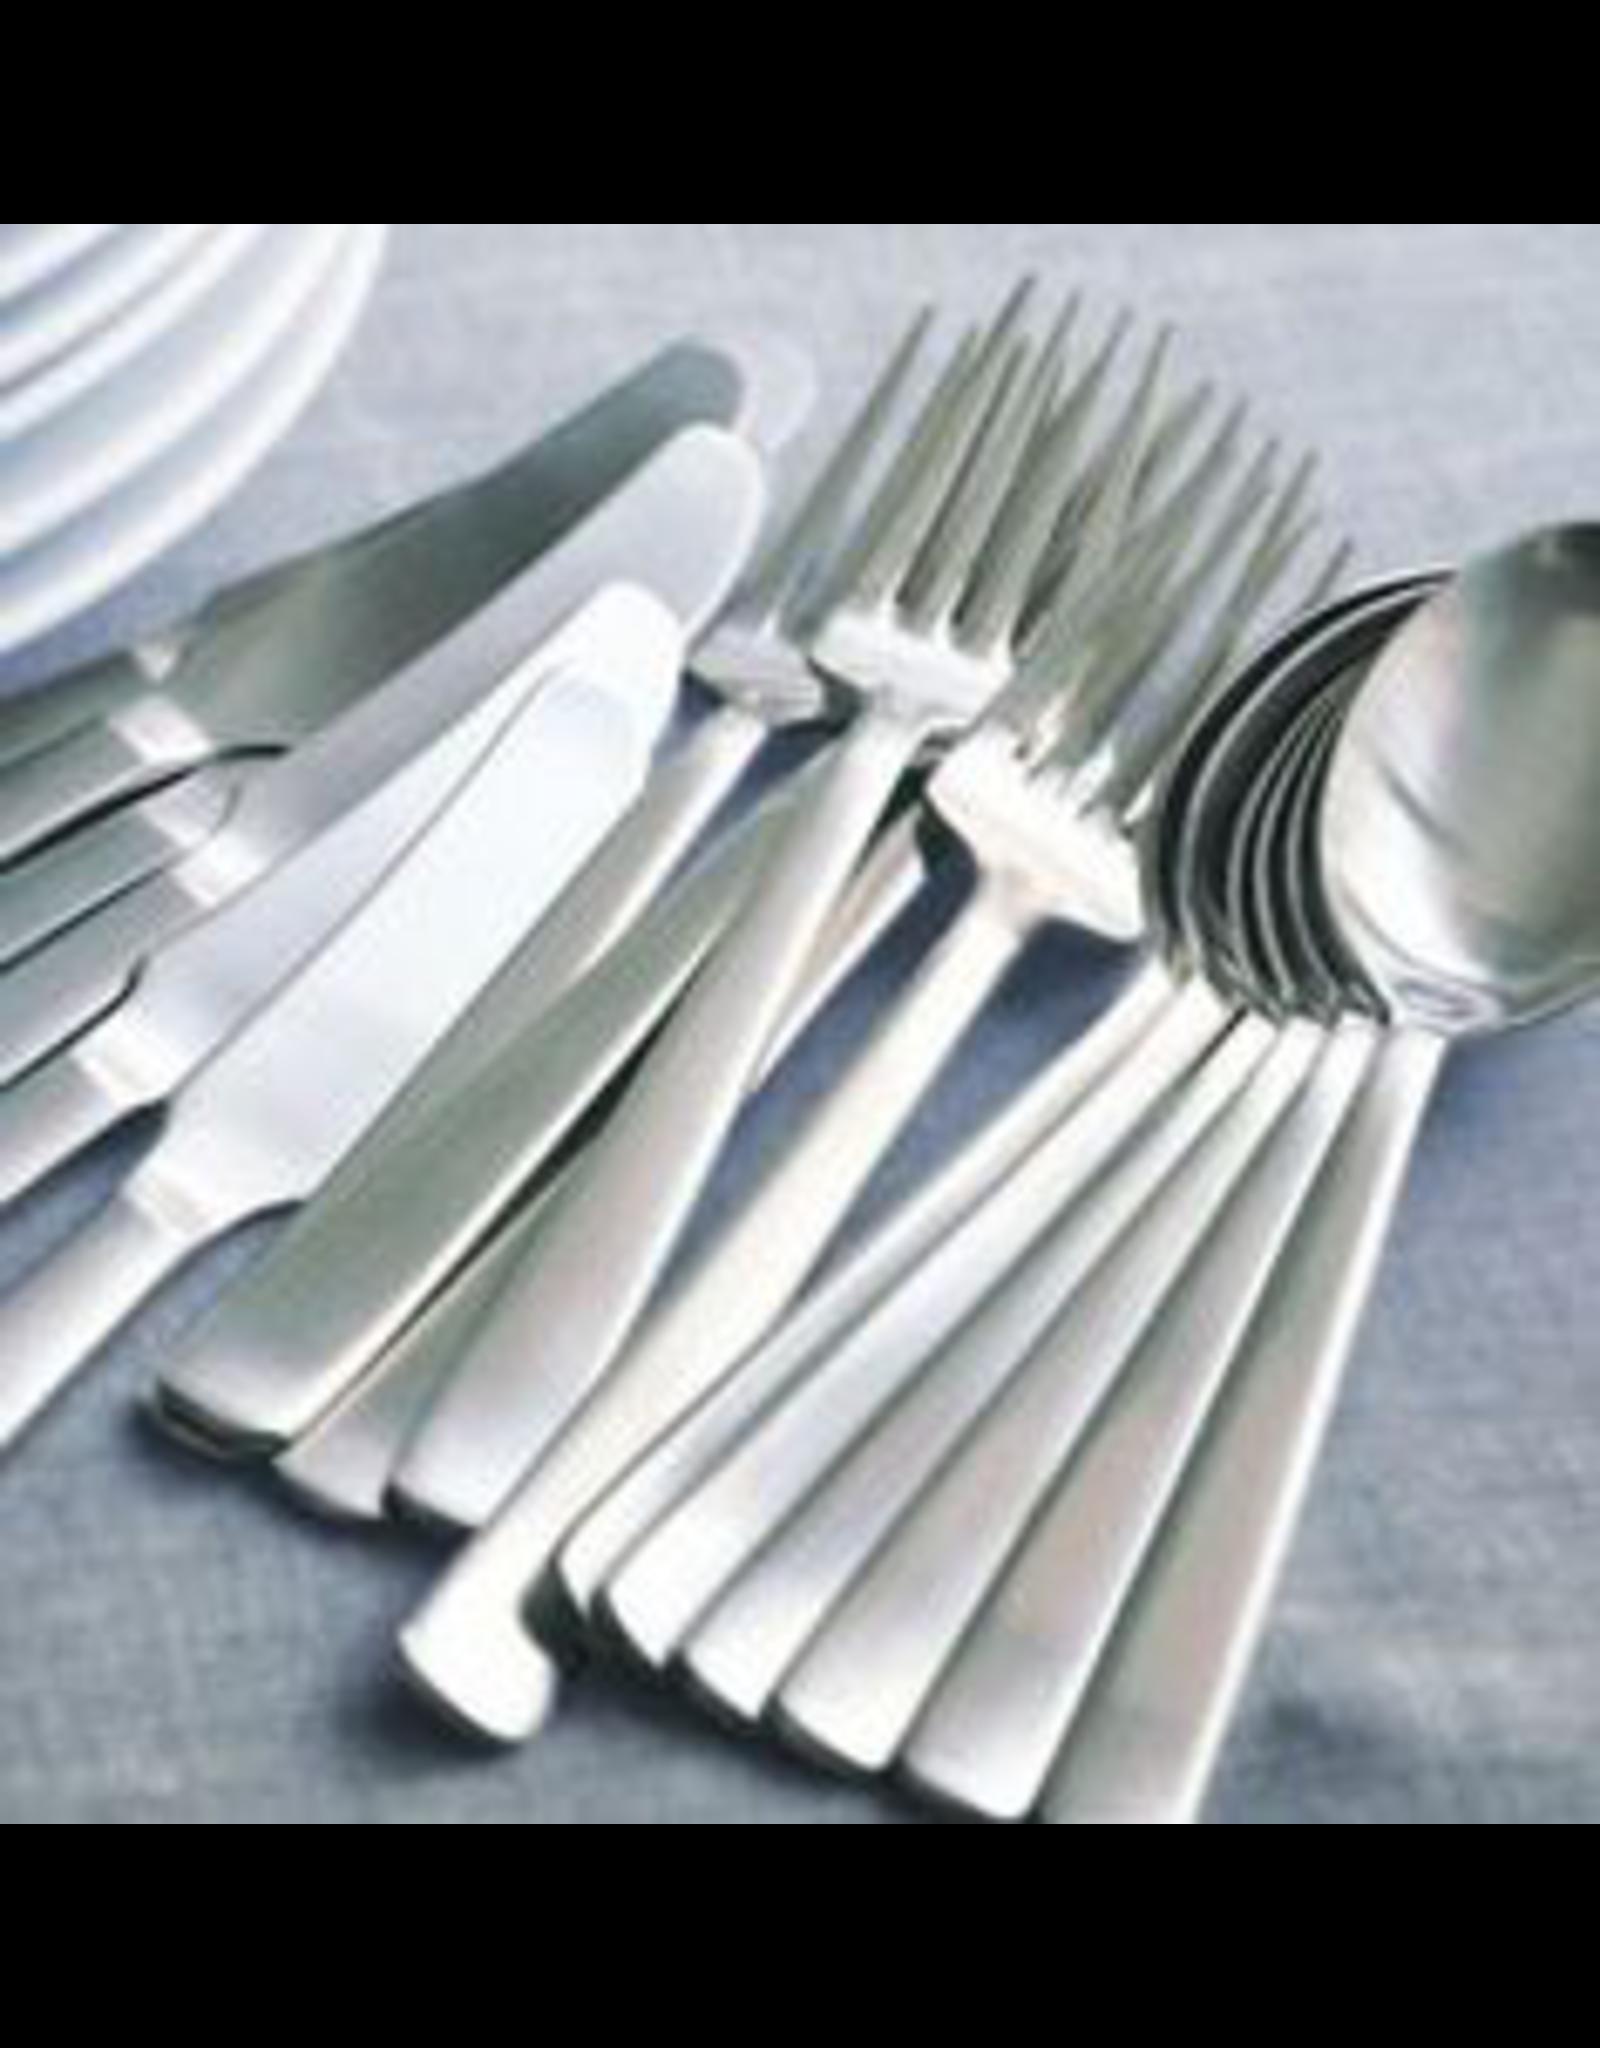 GRAND PRIX 不銹鋼午餐餐具套装三件套